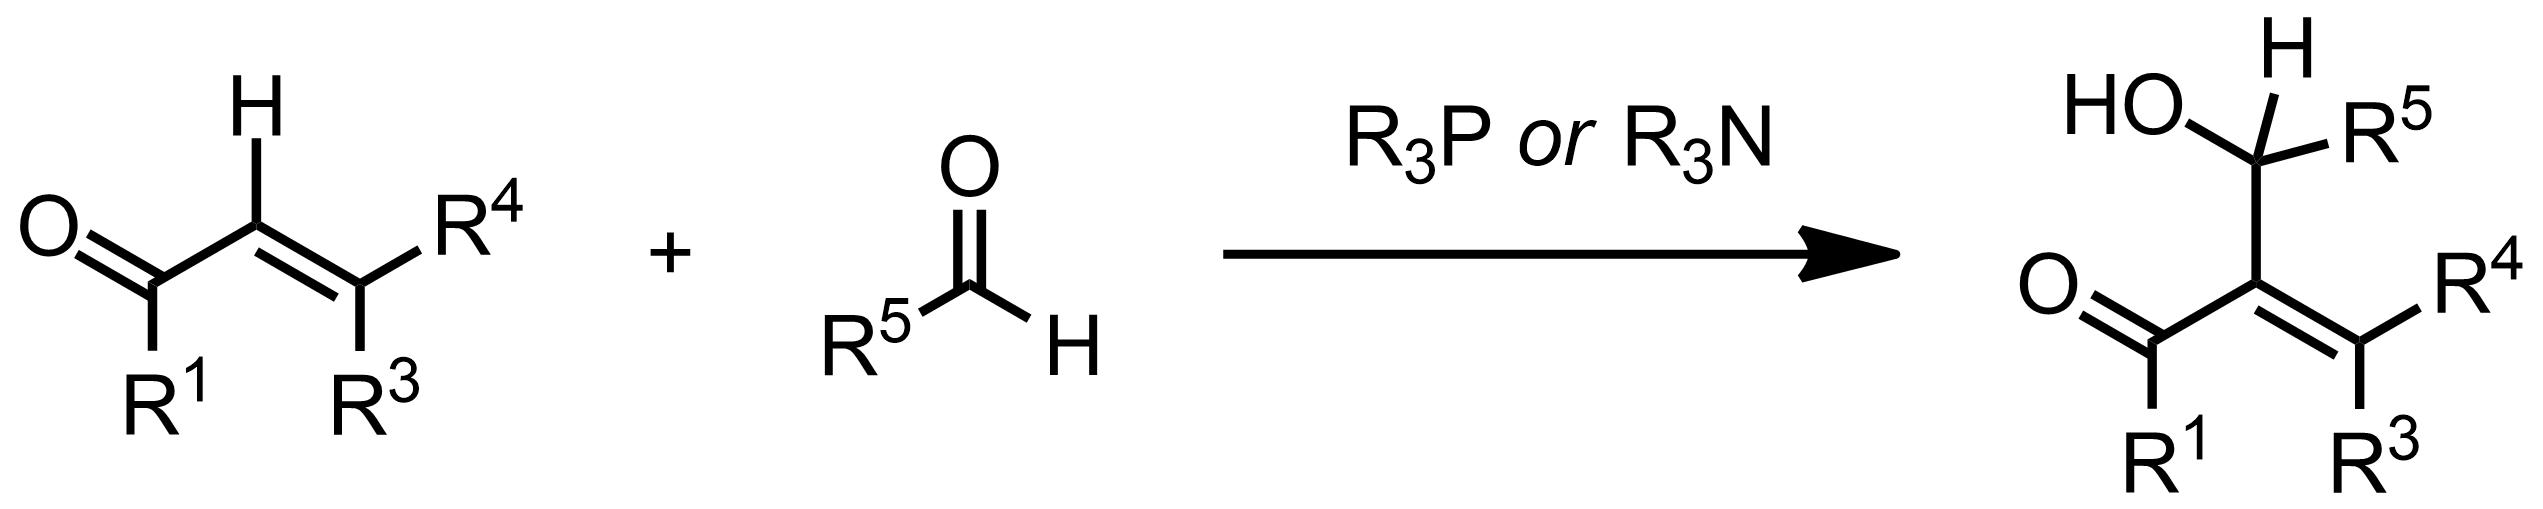 Schematic representation of the Morita-Baylis-Hillman Reaction.